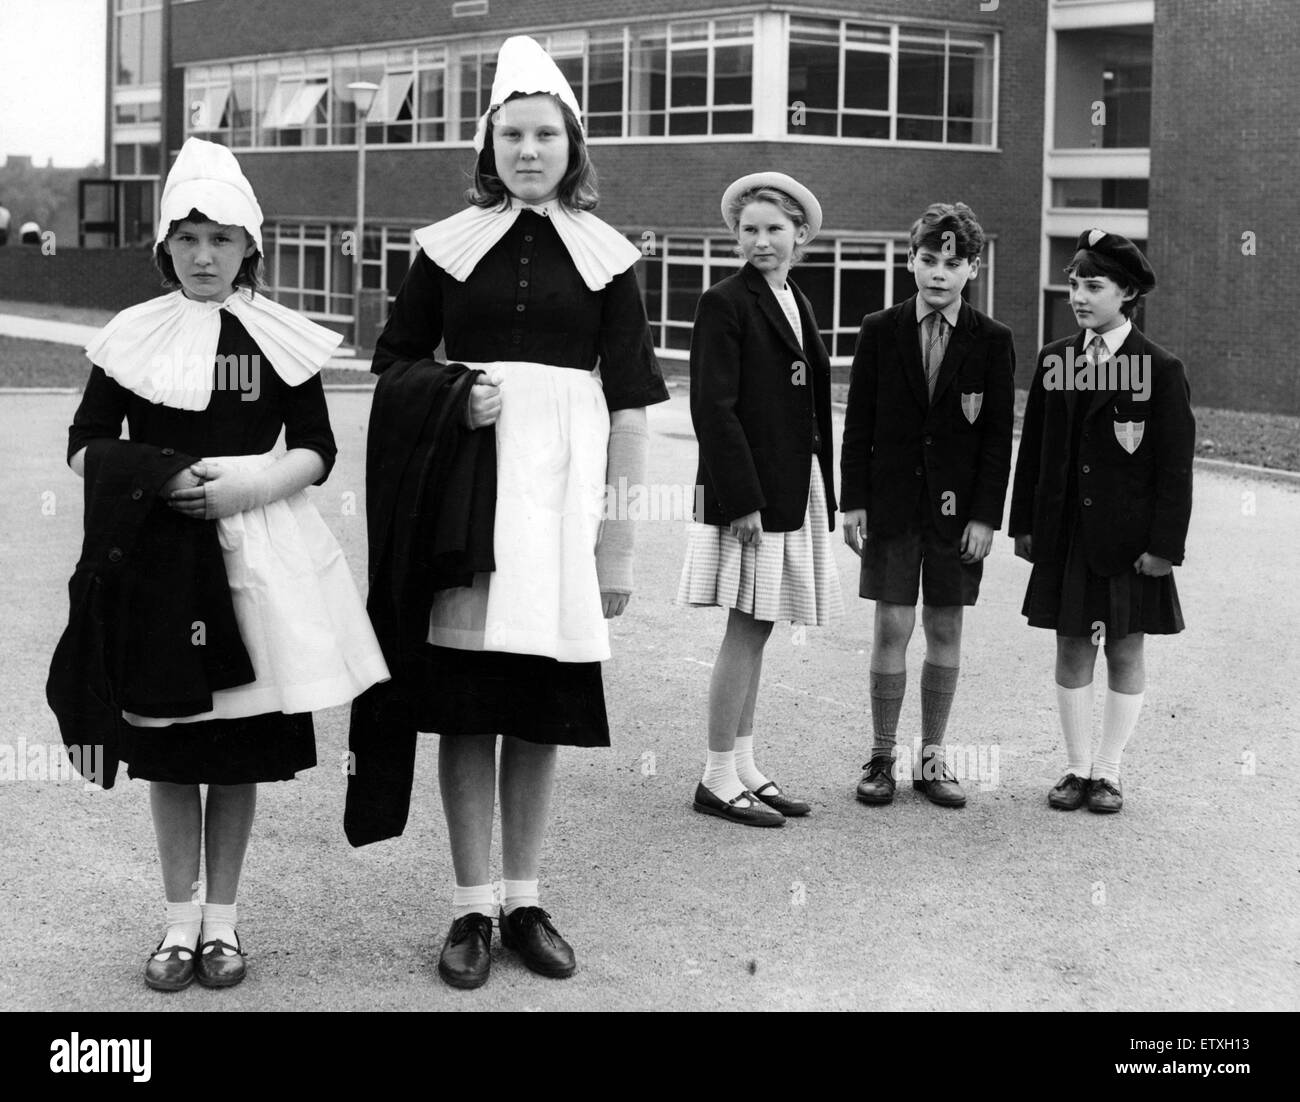 Blue Coat School uniform, Coventry  3rd June 1965 Stock